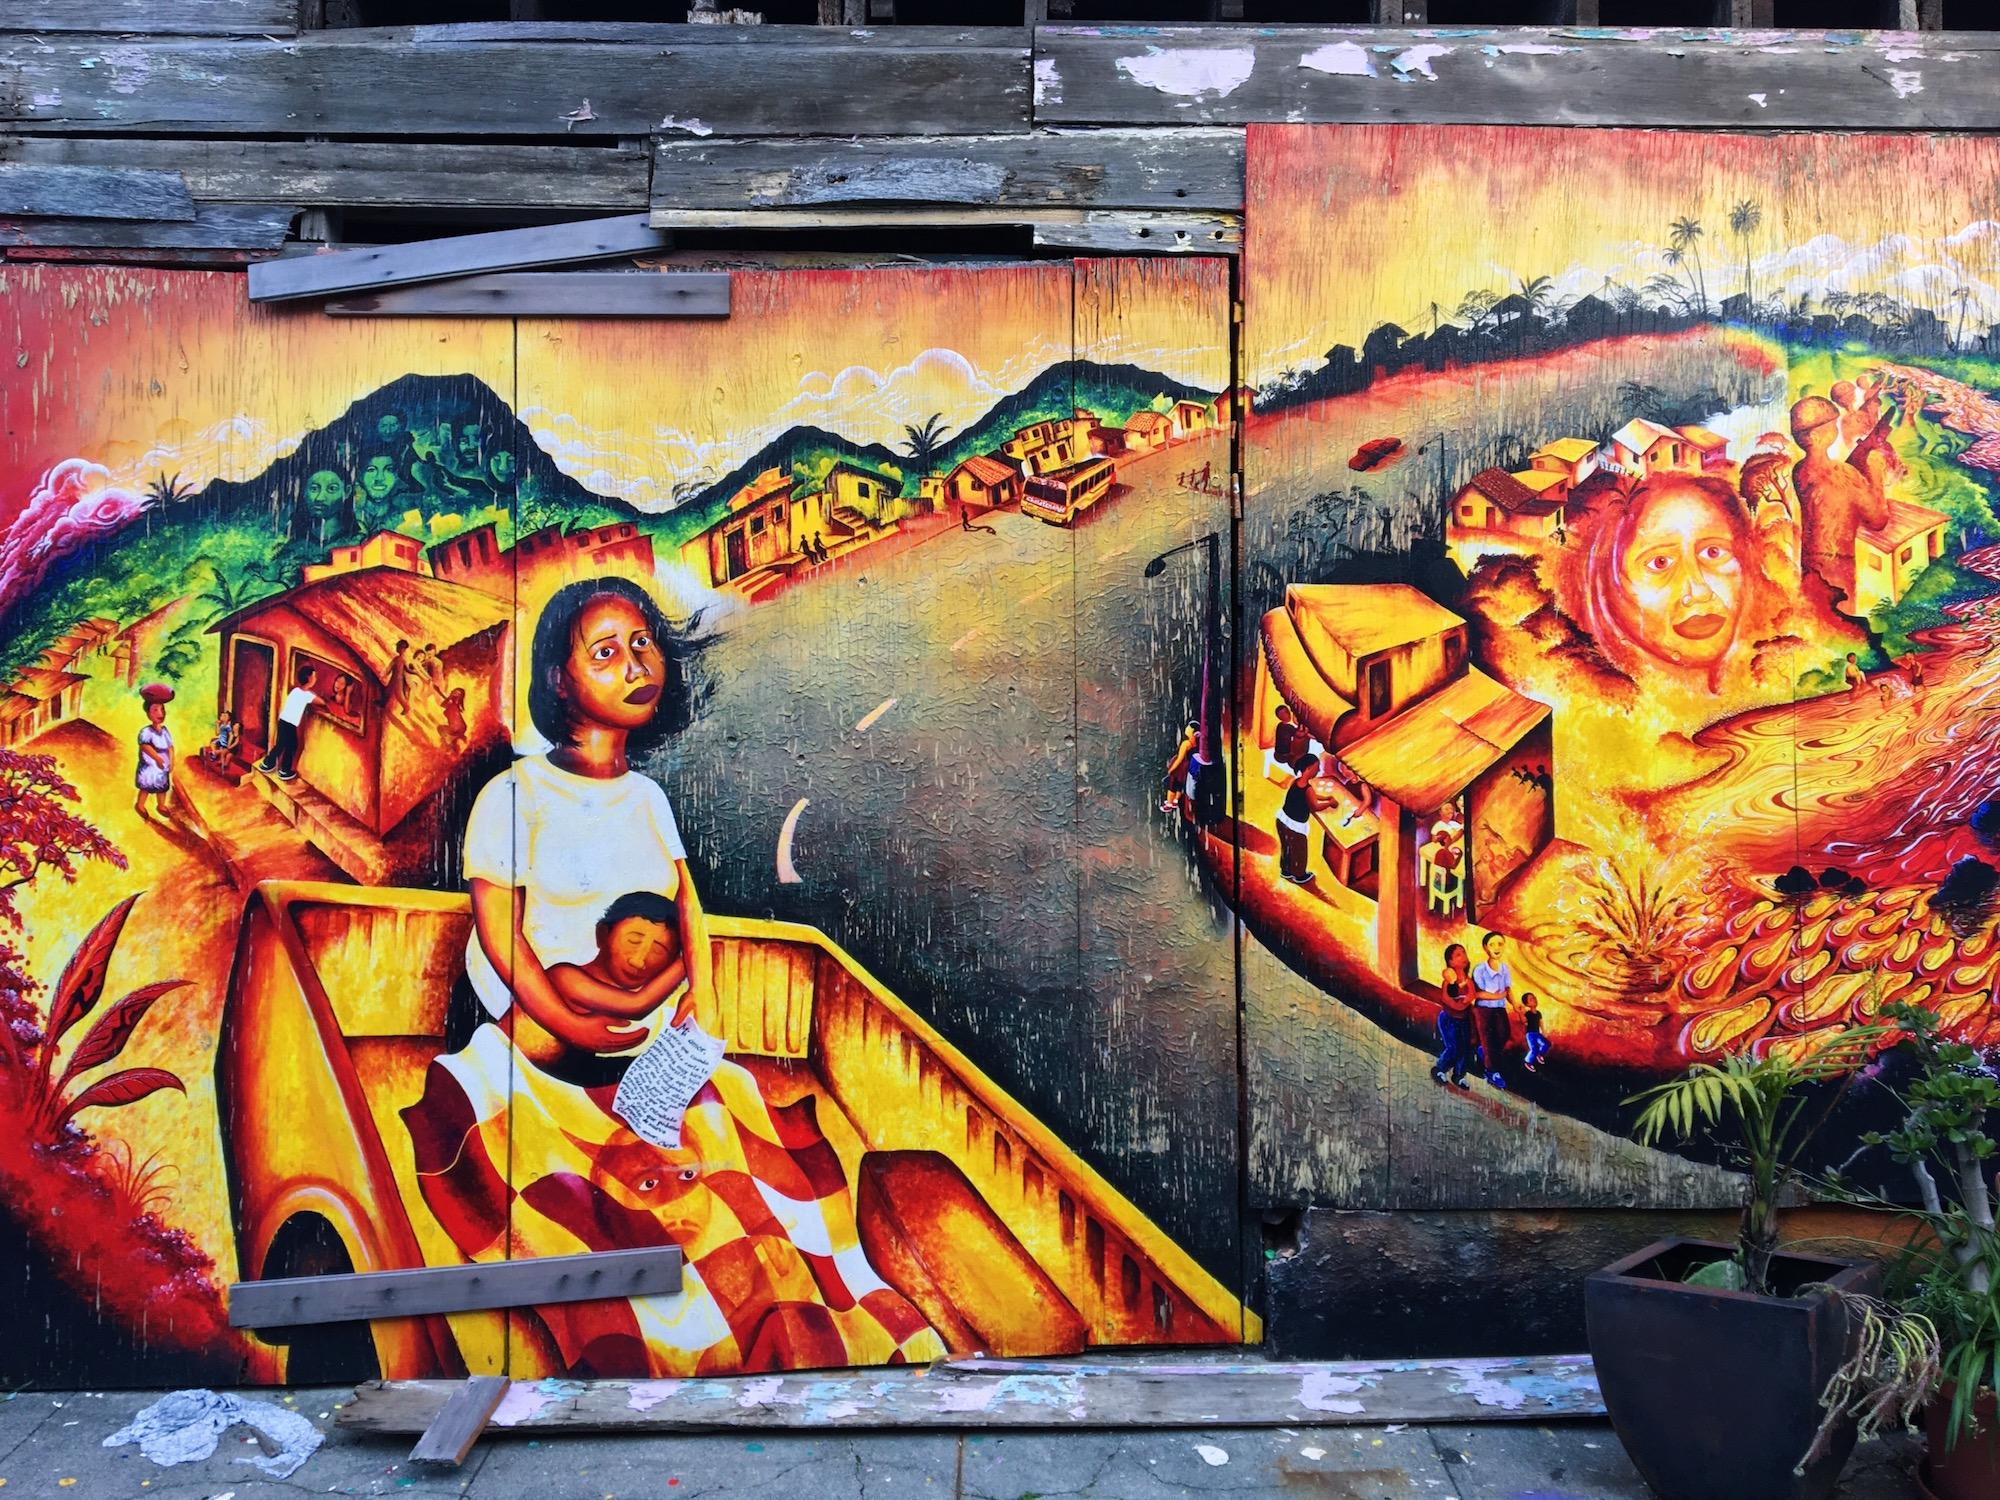 Balmy Alley - Murales nel quartiere Mission di San Fracisco - Past That Still Lives (2004) - Joel Bergner1